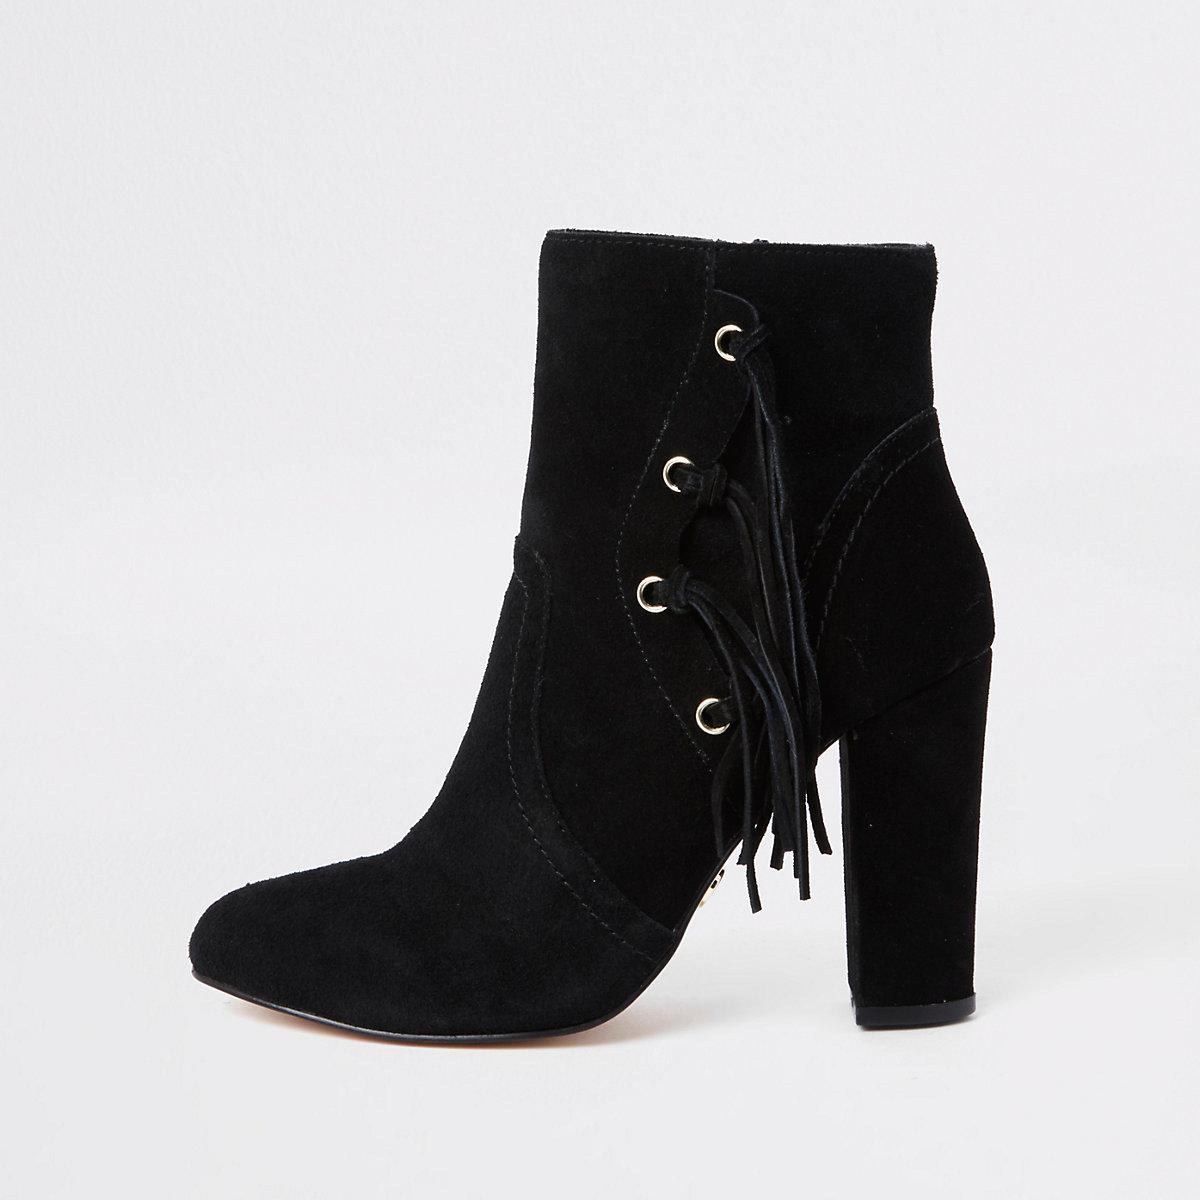 Black suede side tassel block heel boots